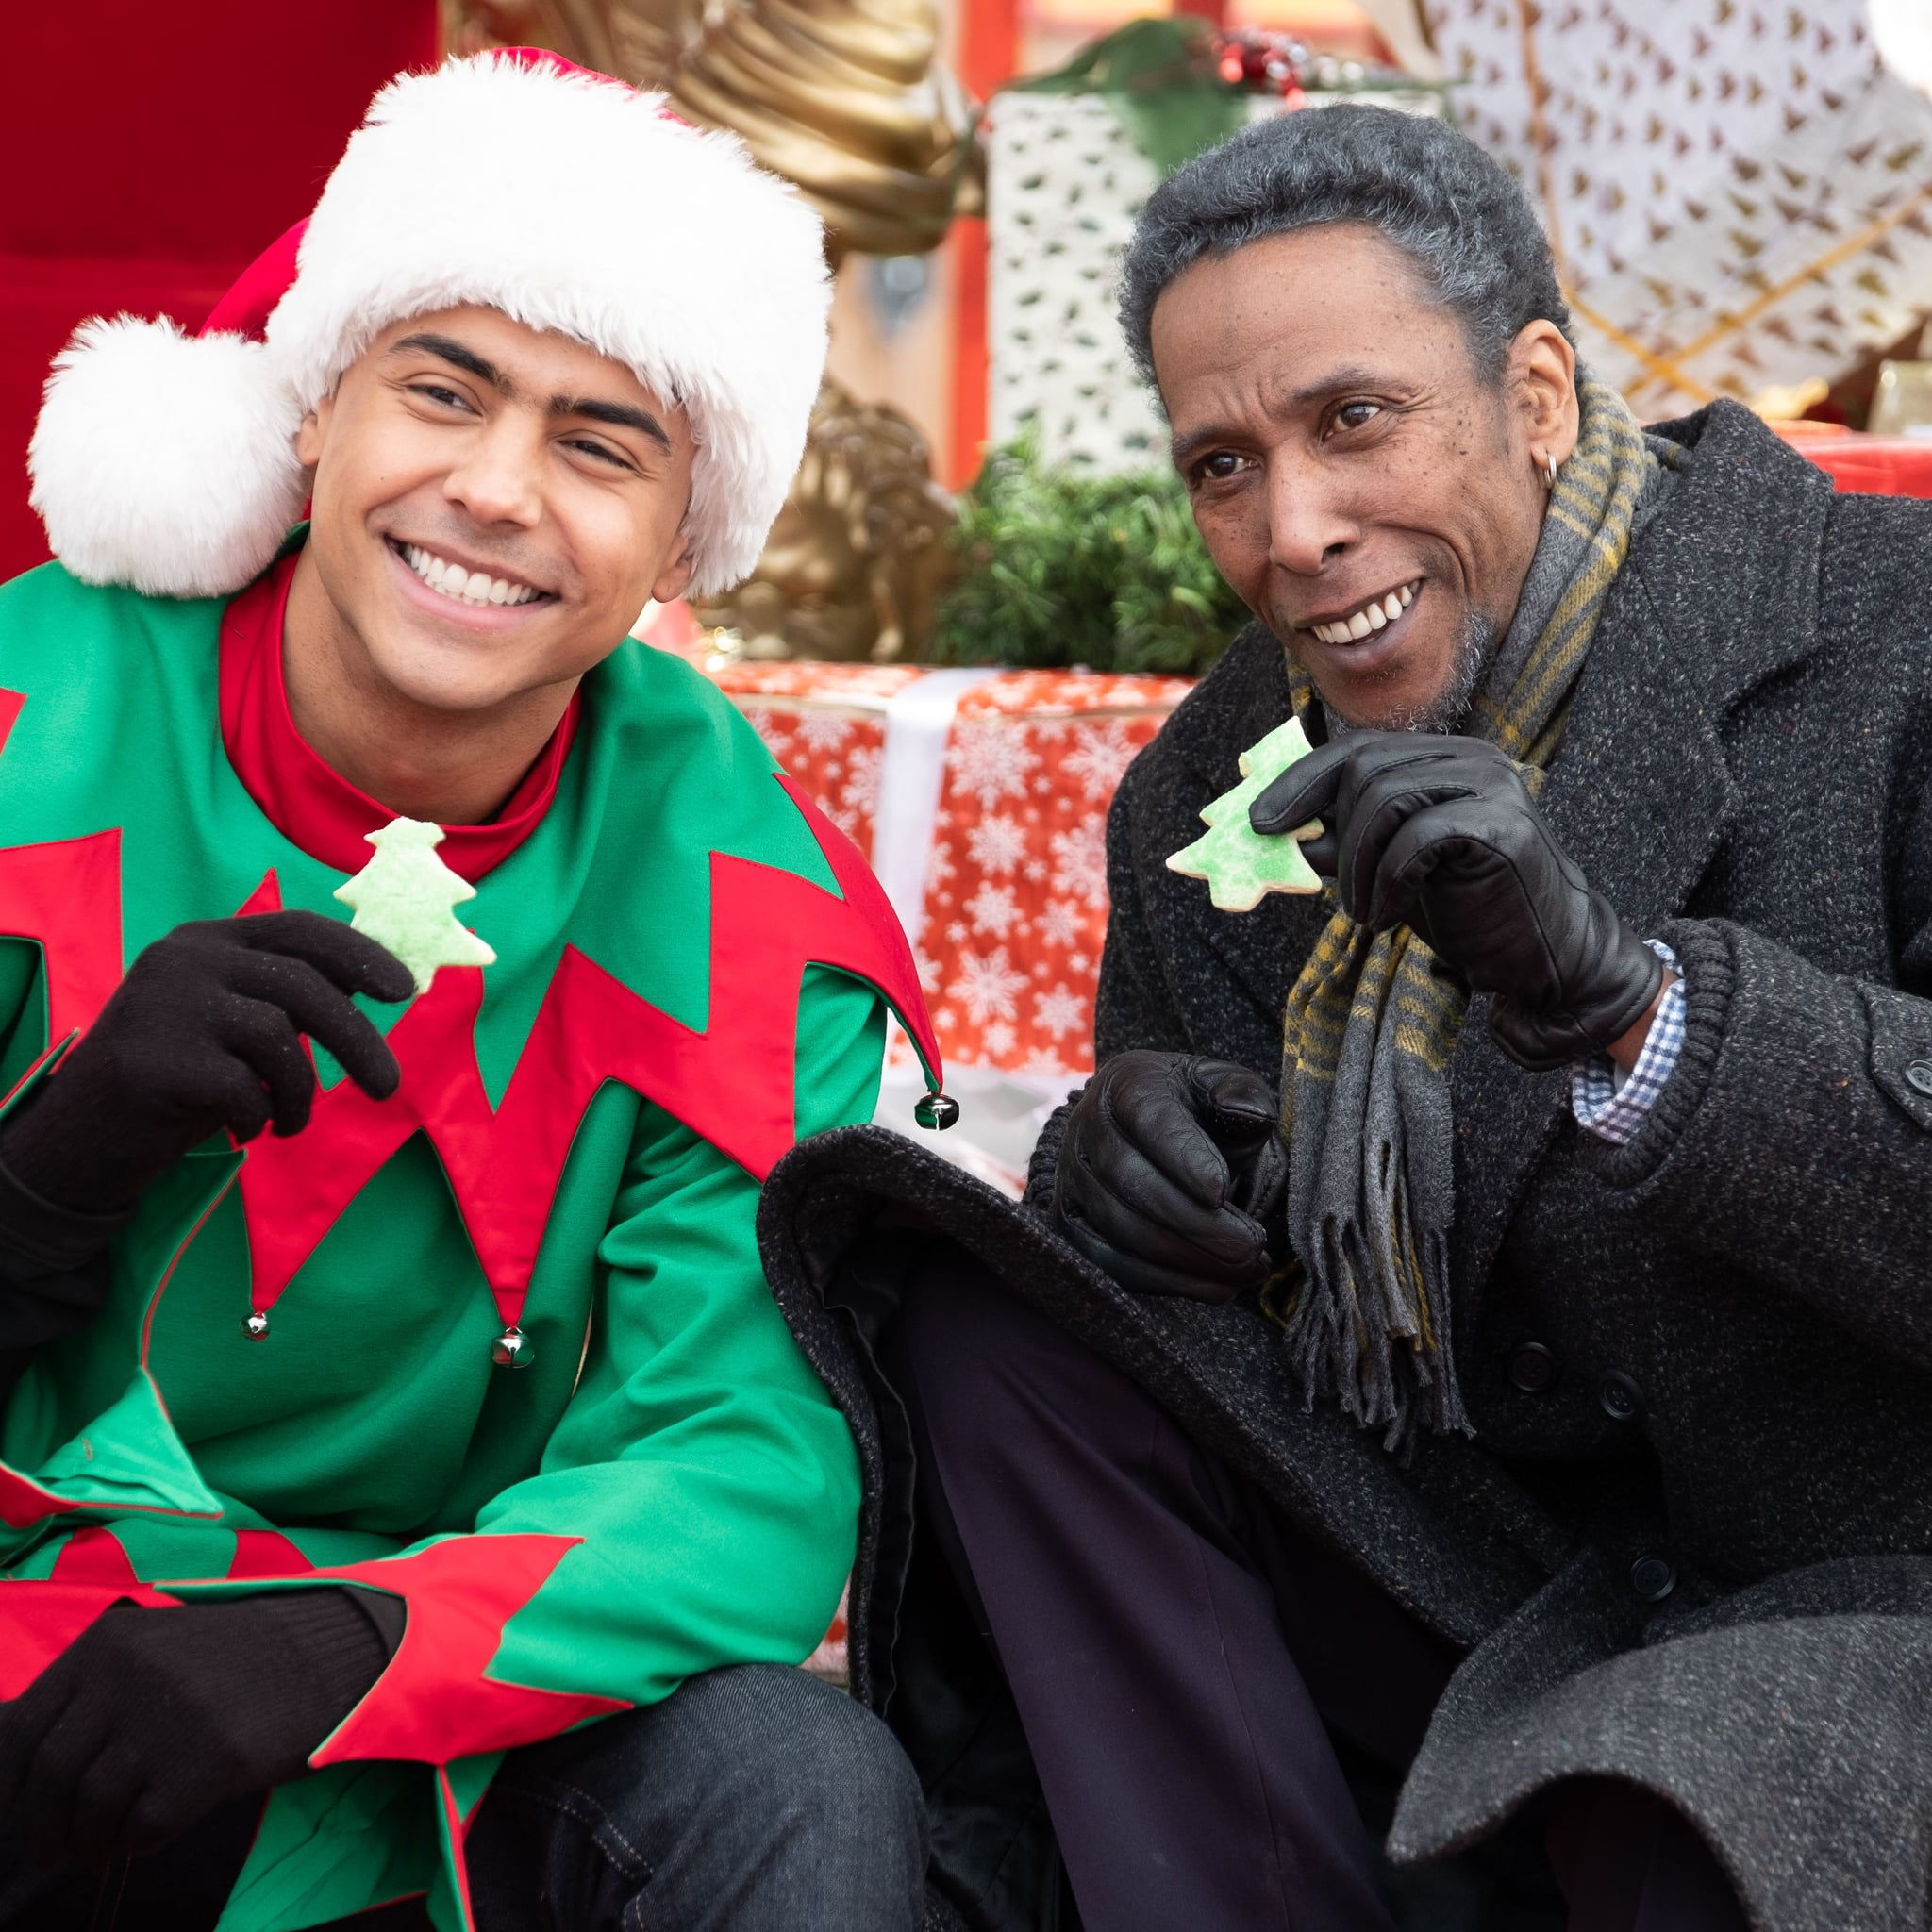 best holiday romantic comedies on netflix popsugar entertainment - Best Christmas Comedies